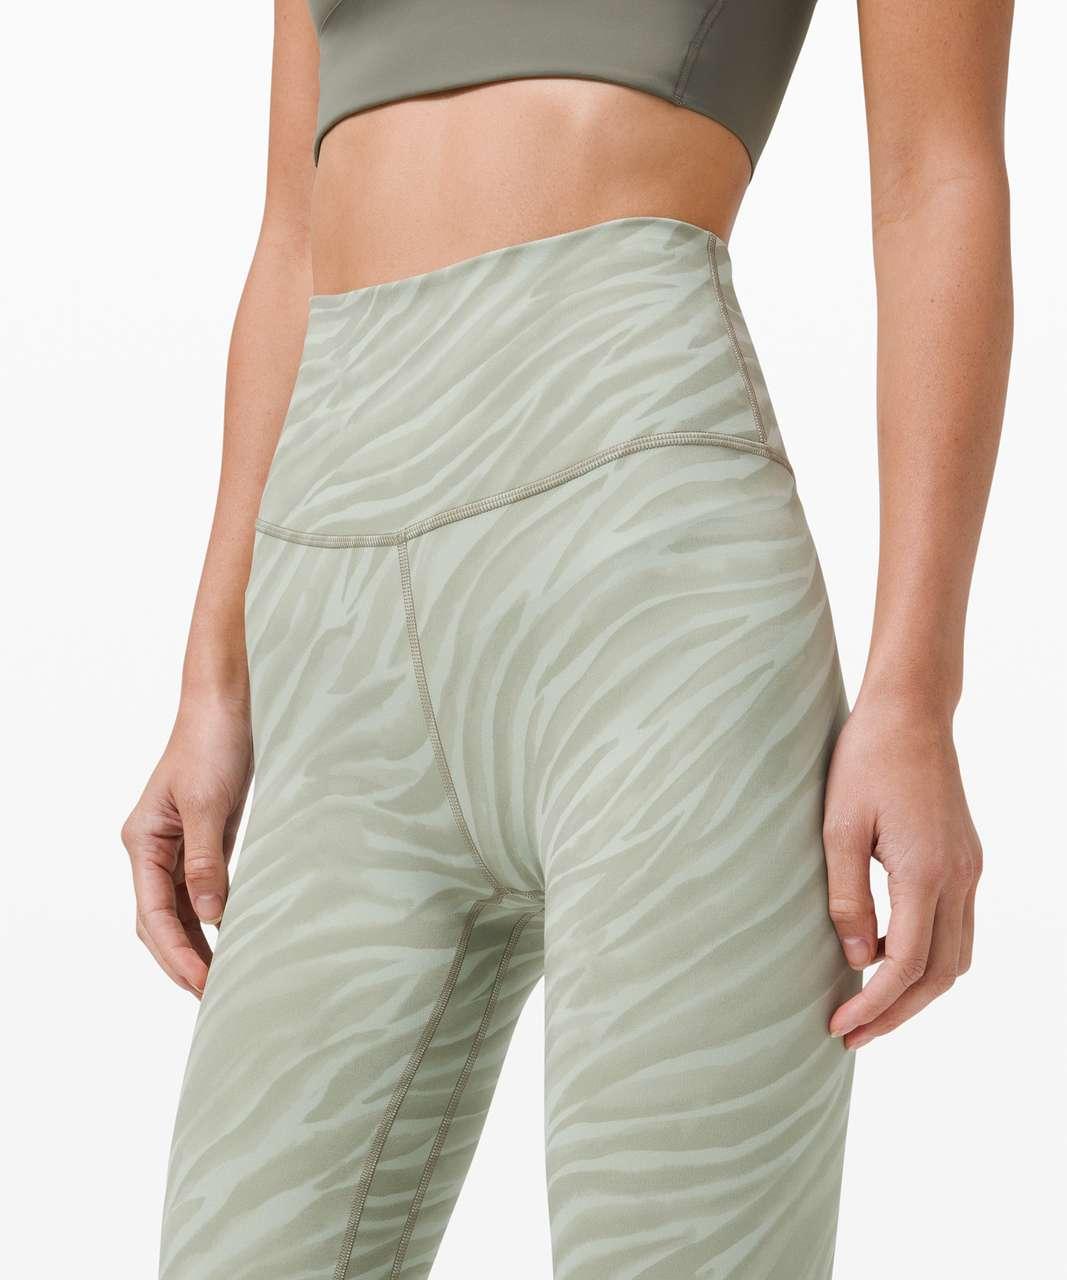 "Lululemon Align Pant 25"" - Le Tigre Camo Green Fern Multi"